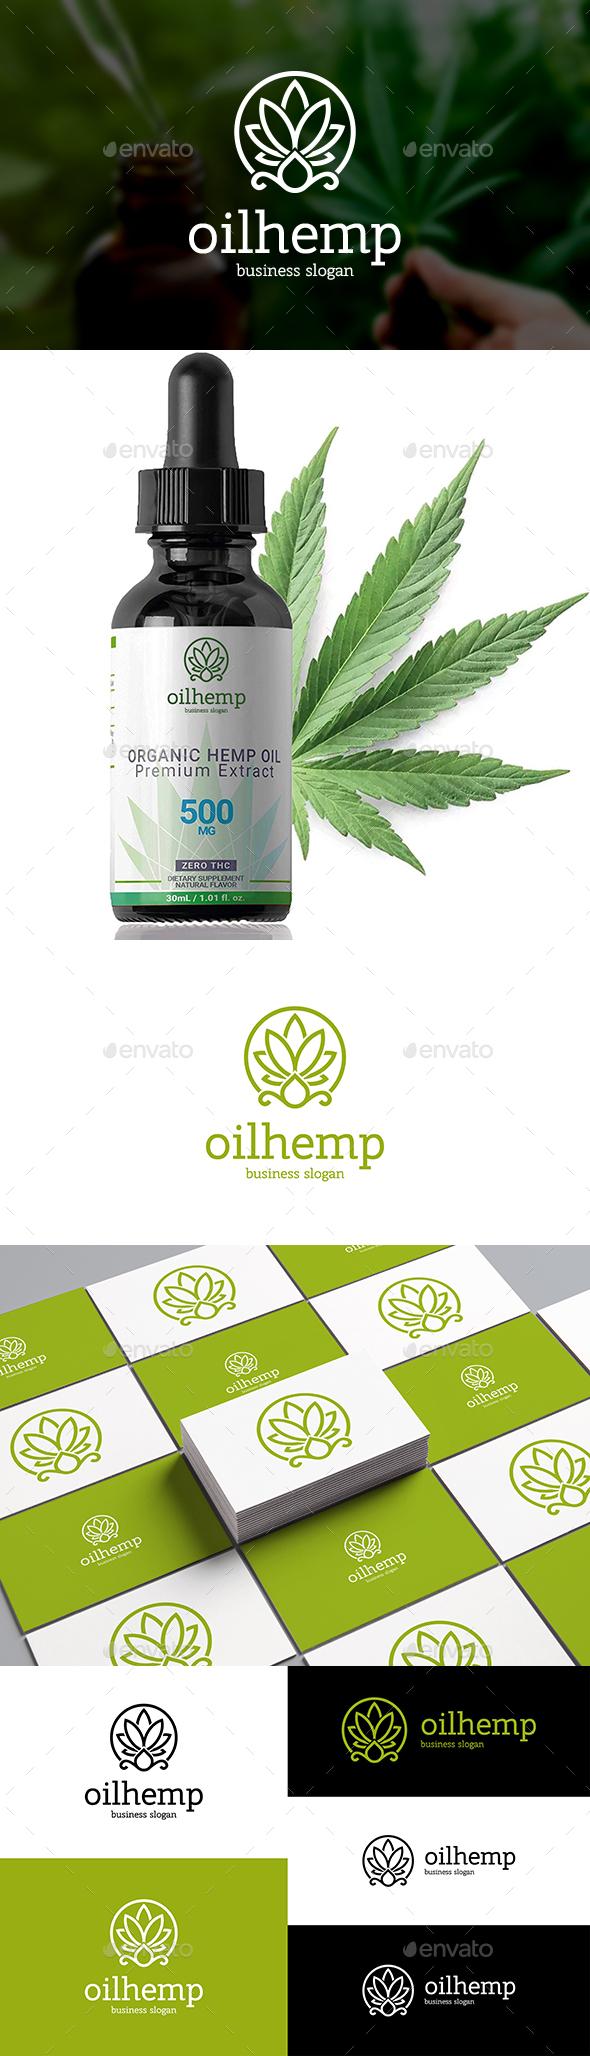 Cannabis Oil Logo Hemp Marijuana Leaf and Drop